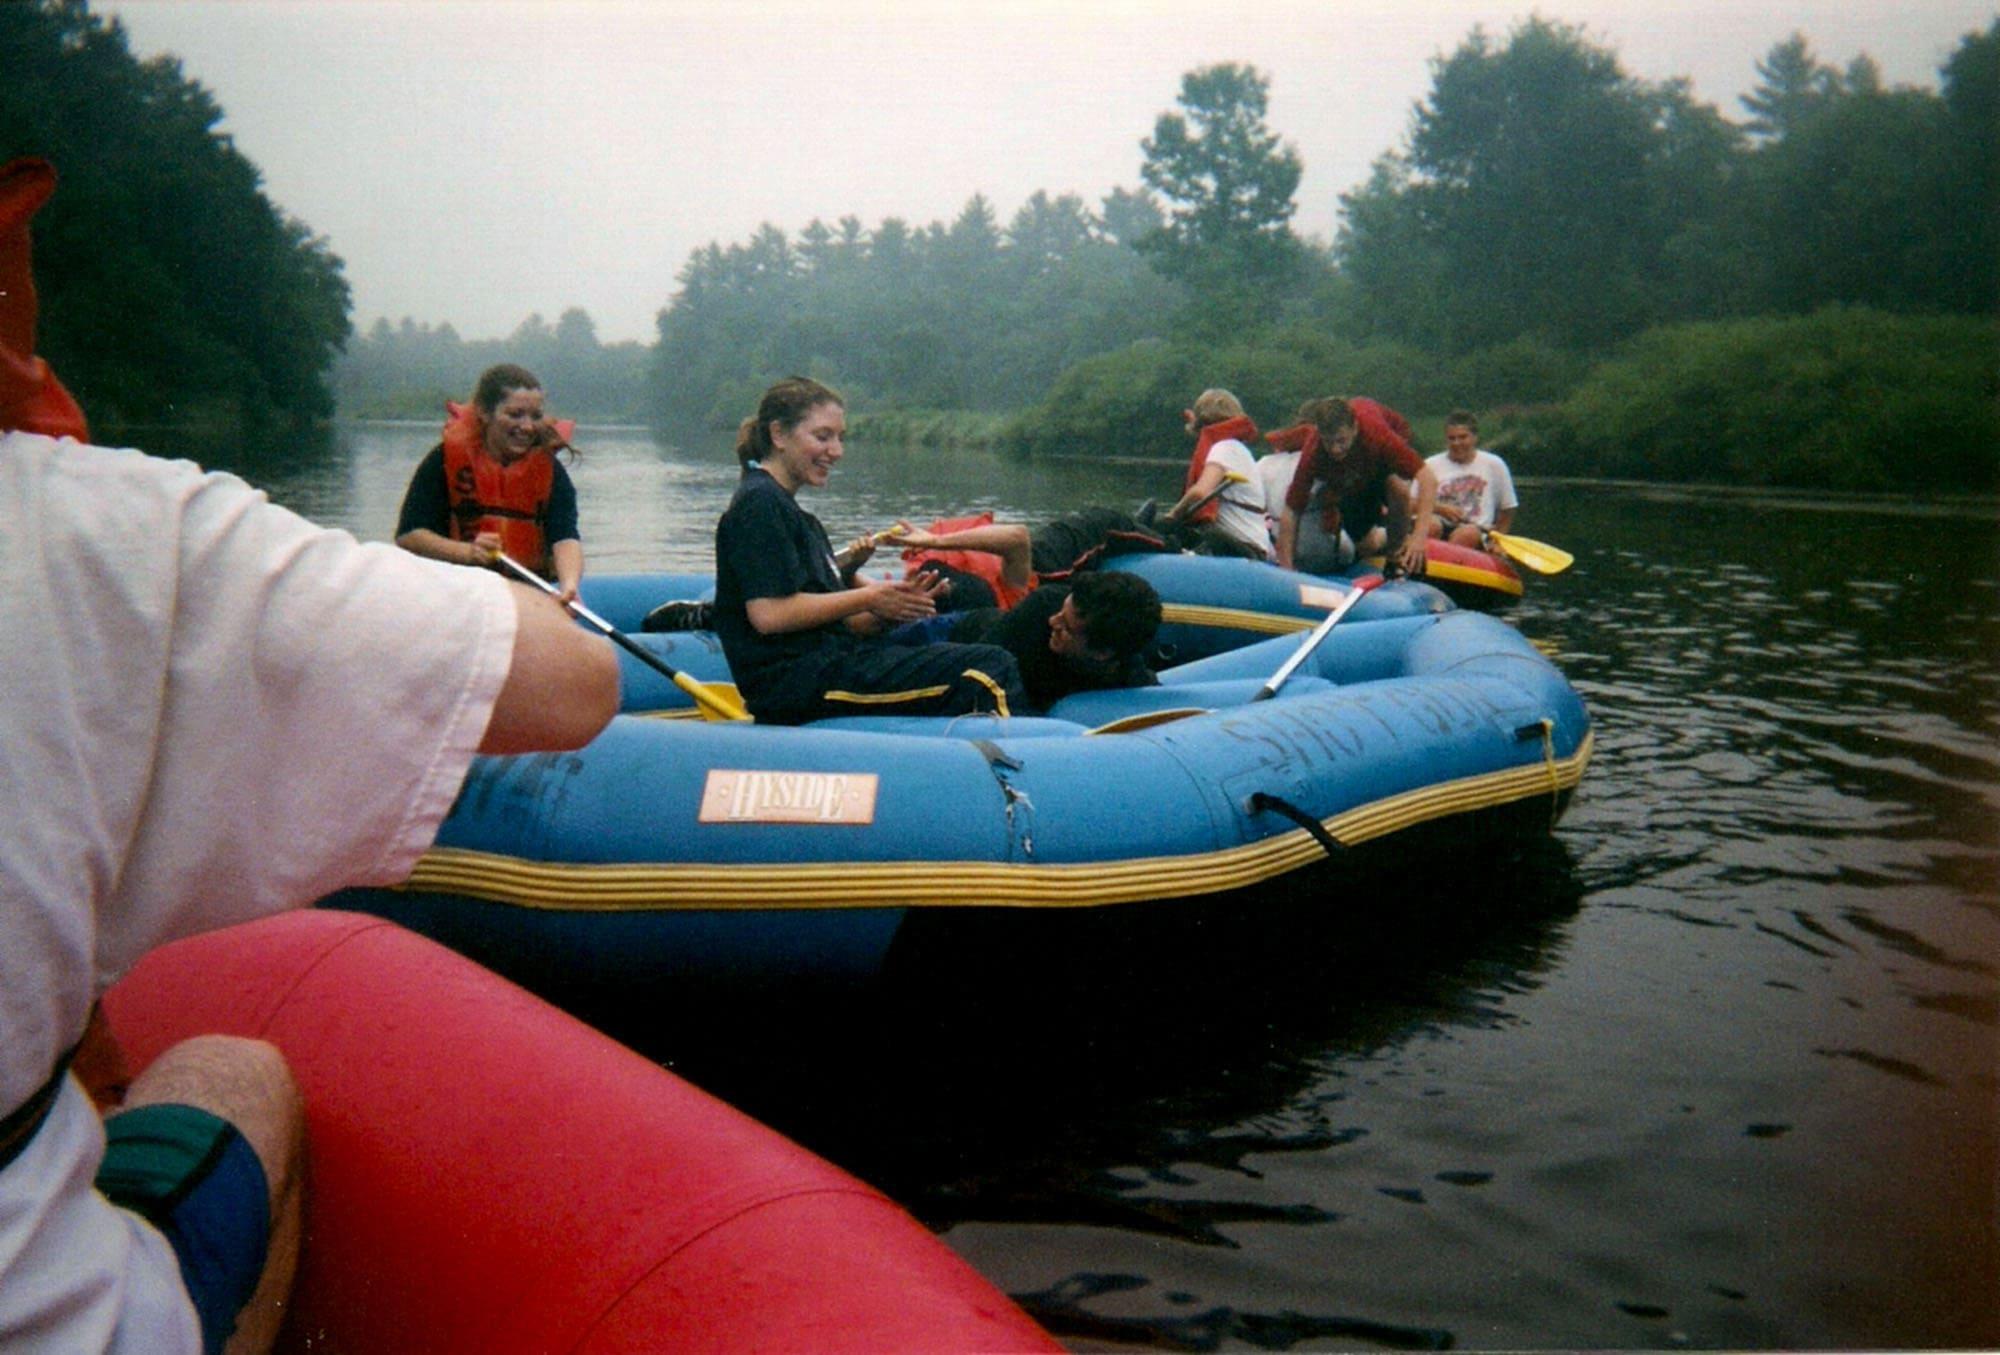 White water rafting at Shotgun Eddy's in Wisconsin